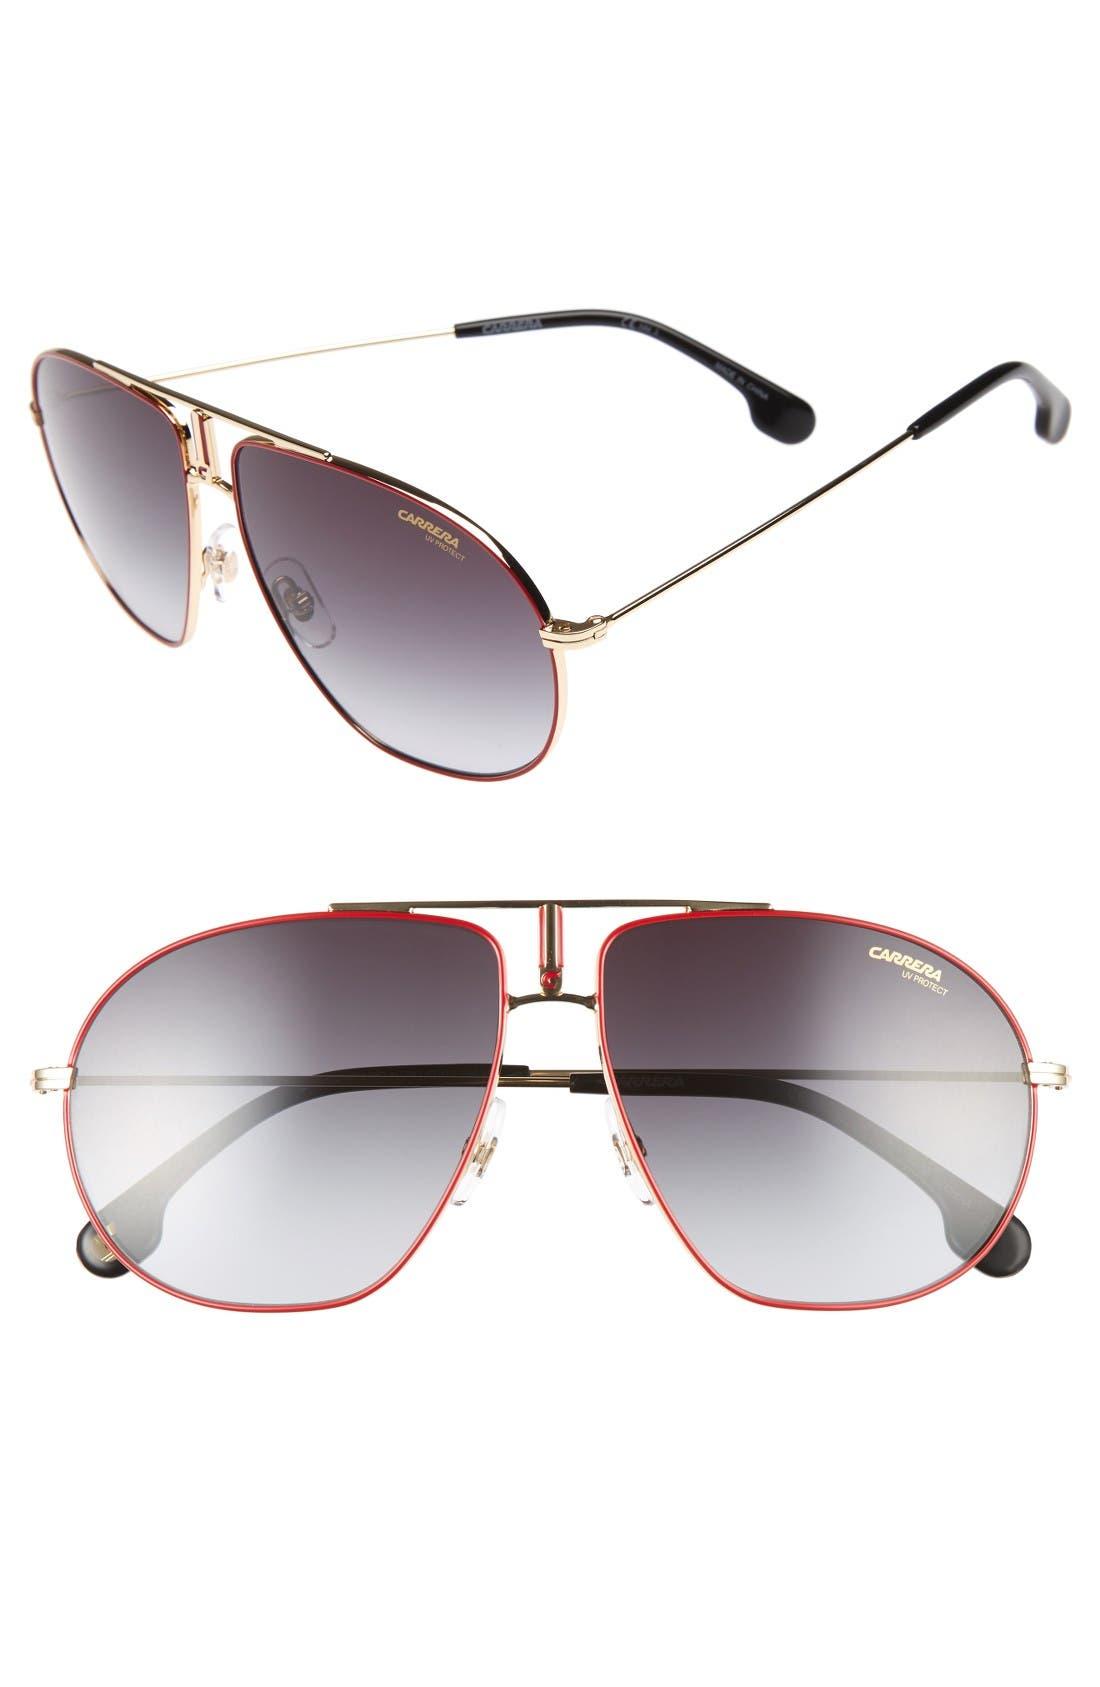 Carrera Bound 62mm Sunglasses,                         Main,                         color, Red Gold